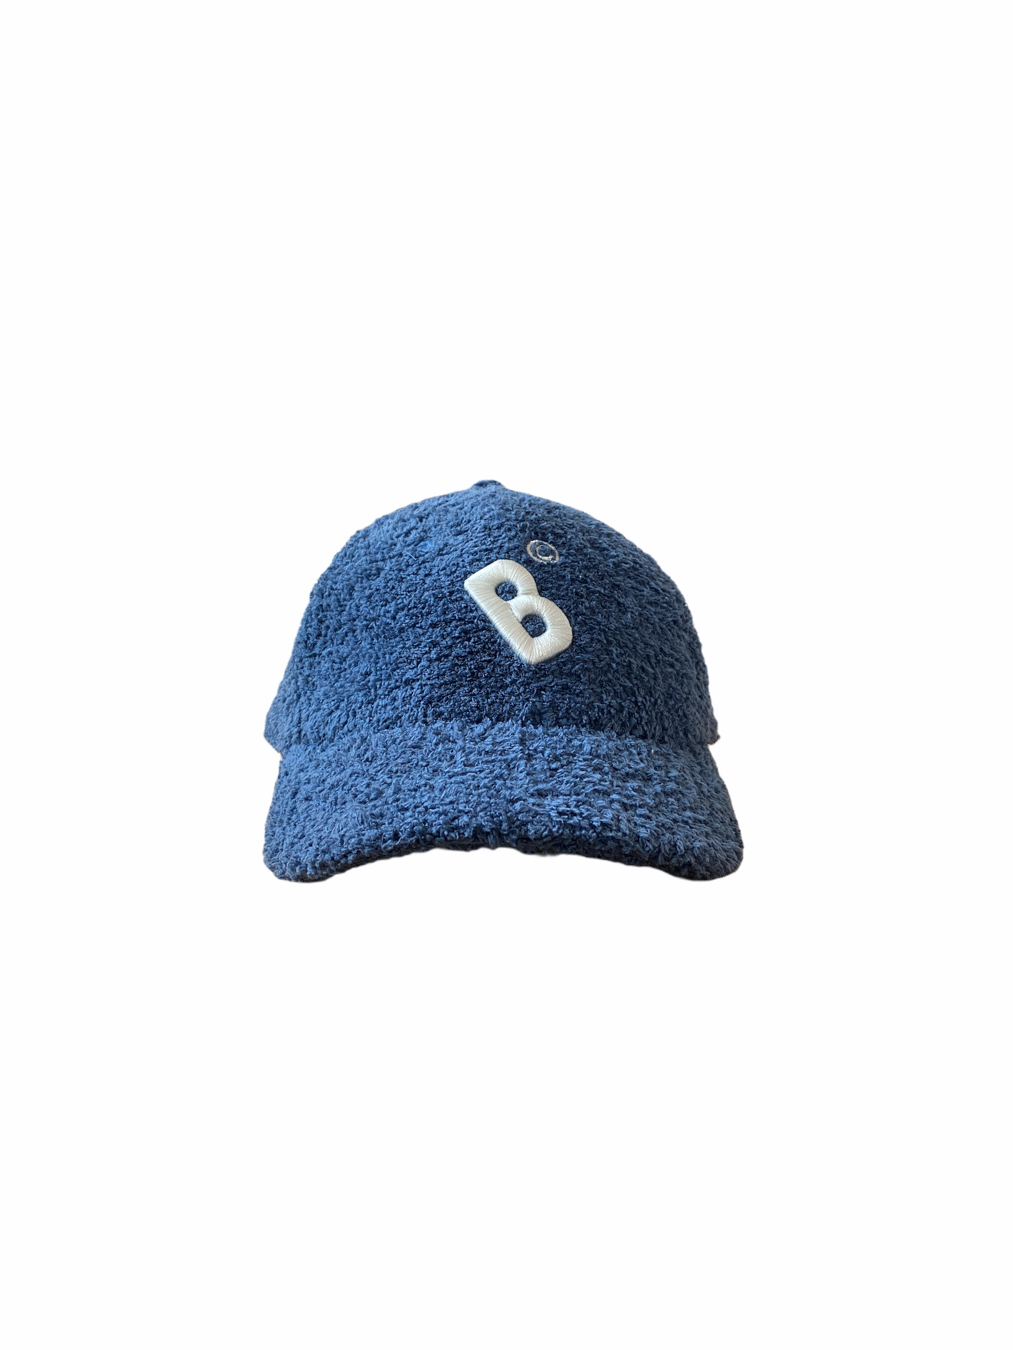 Bangkokr Cap (Blue)